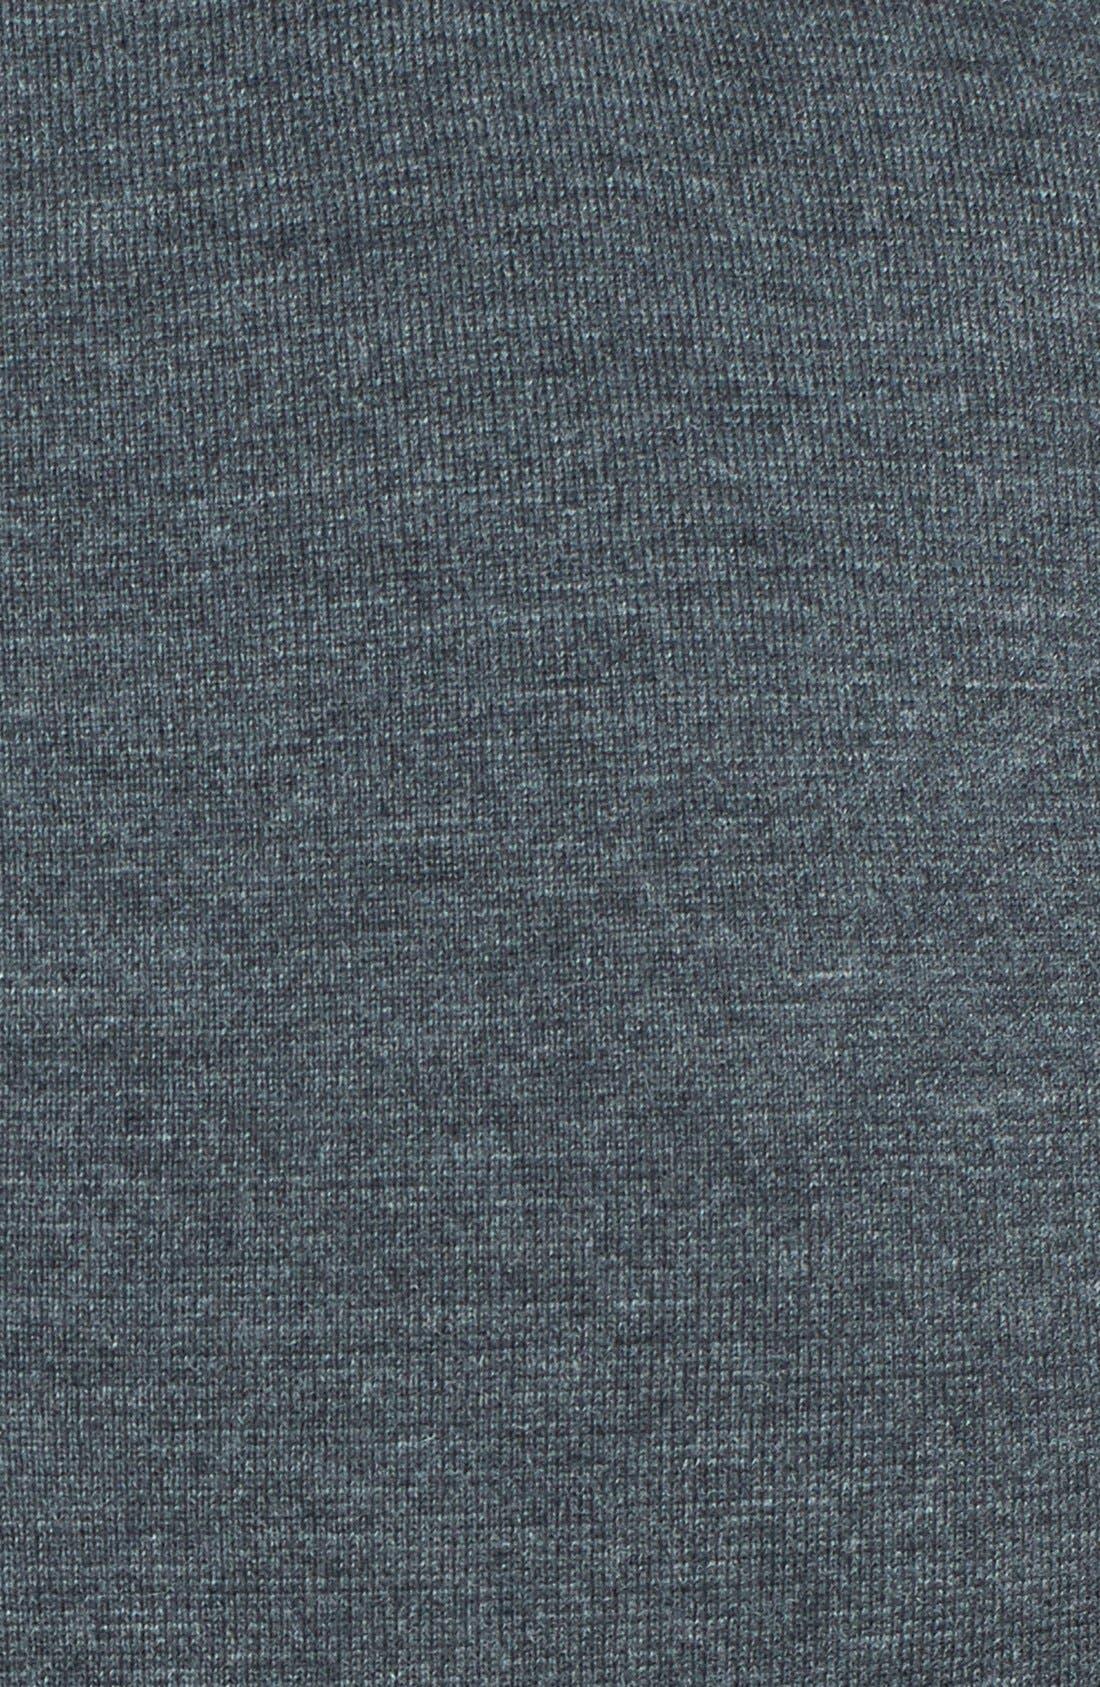 Alternate Image 3  - Tory Burch 'Marcia' Knit Sheath Dress